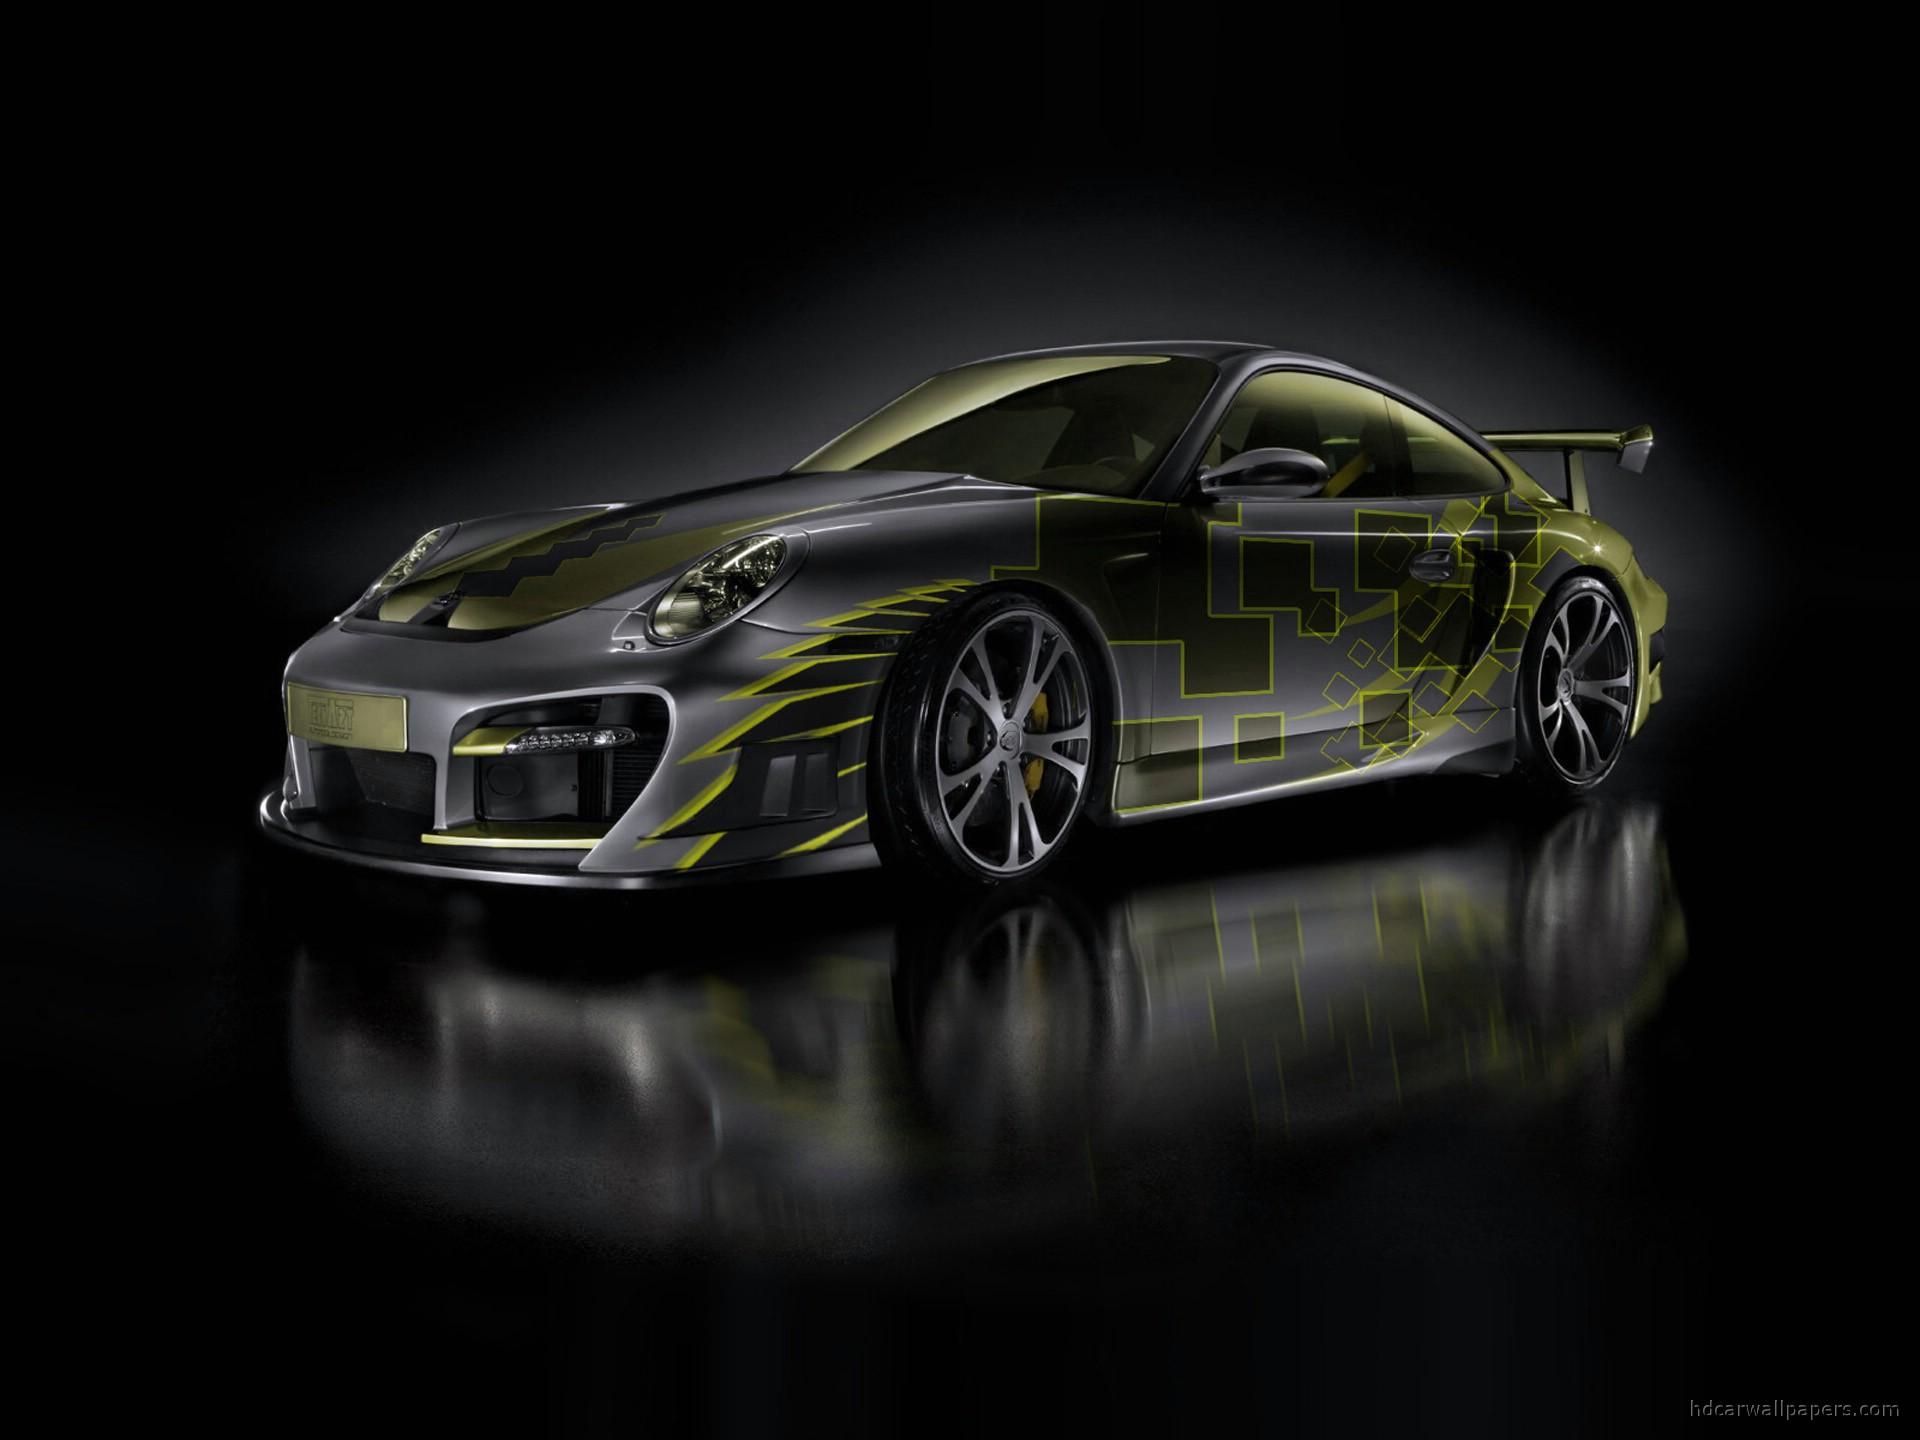 TechArt Porsche 911 Turbo Wallpapers HD Wallpapers 1920x1440